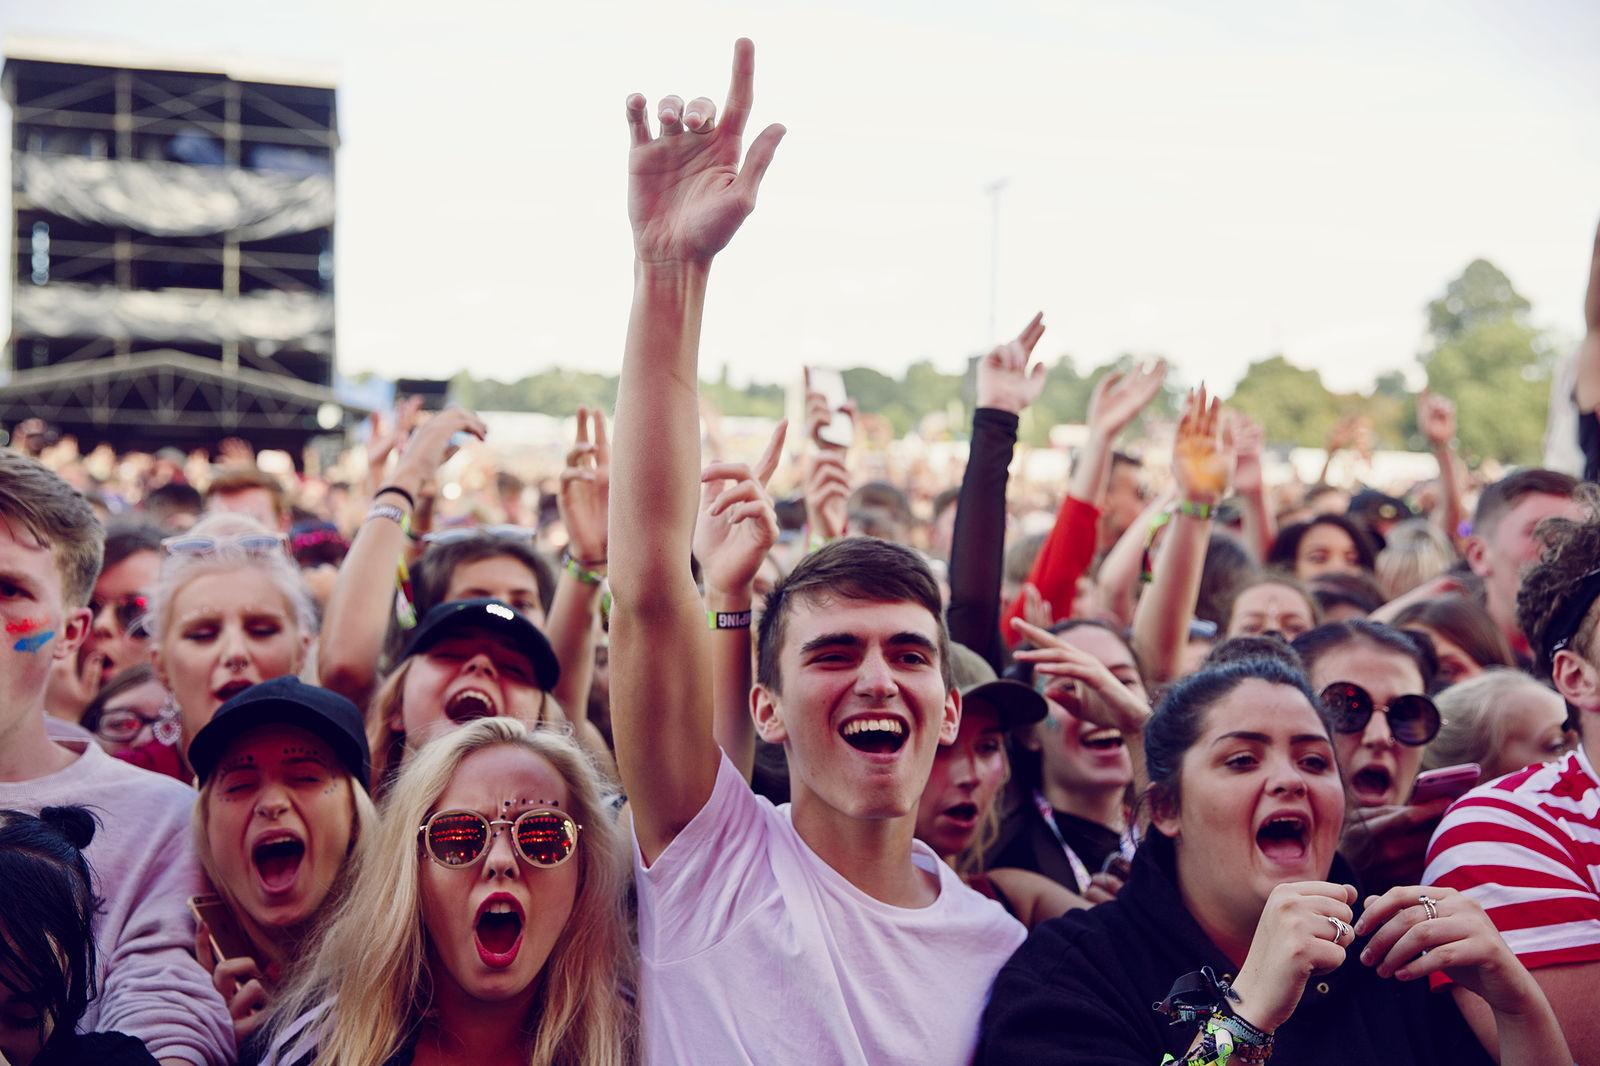 V Festival 2016 - Crowd - Bianca Barrett